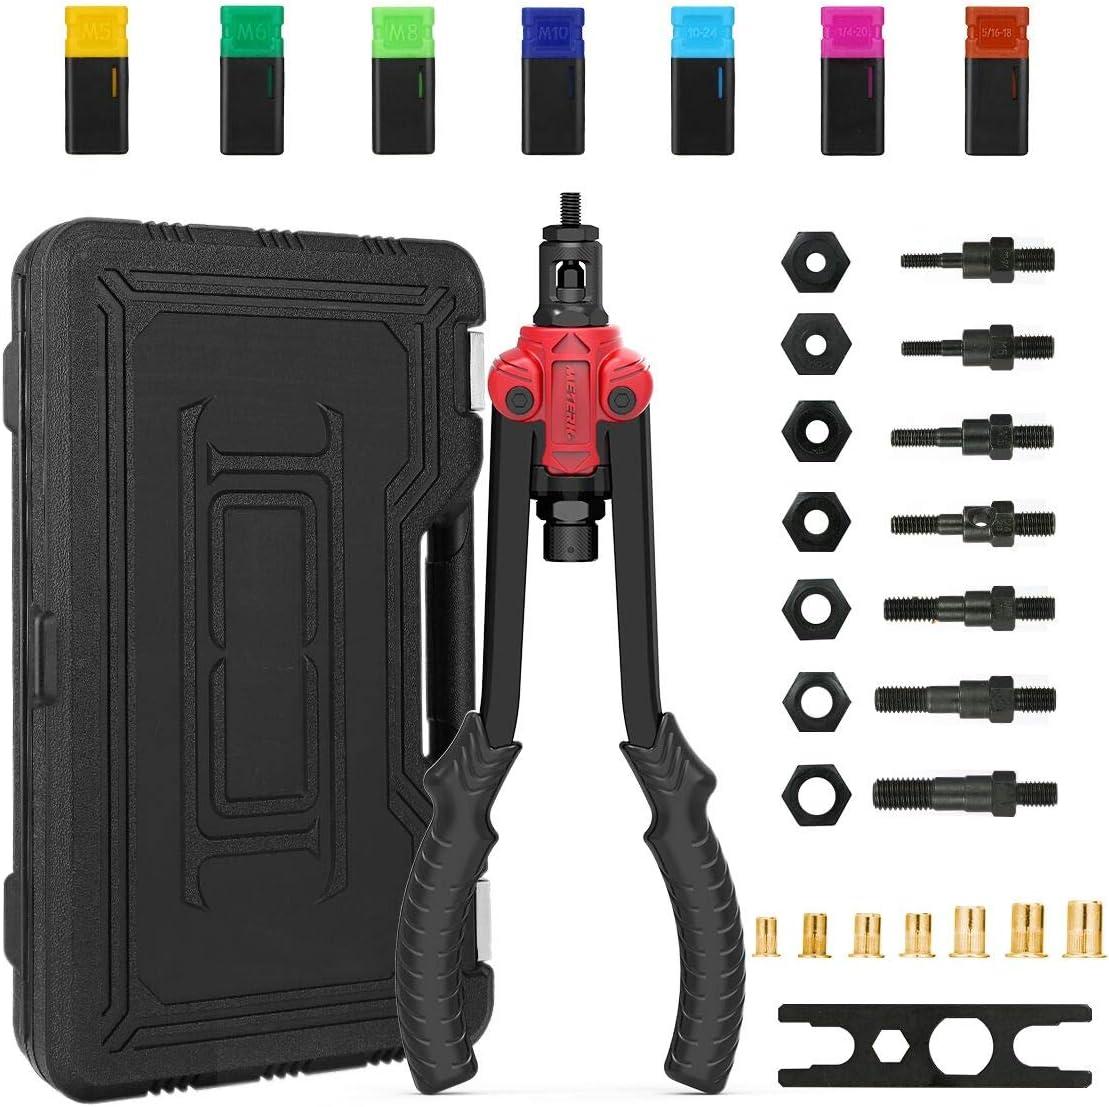 Pistola Remachadora Meterk Remachadora con 7pcs Mandriles Métricos, Tuercas de Remaches 35pcs (5 Tuercas de Remache por eje), Cabeza y Mango de Pistola de Acero al Carbono